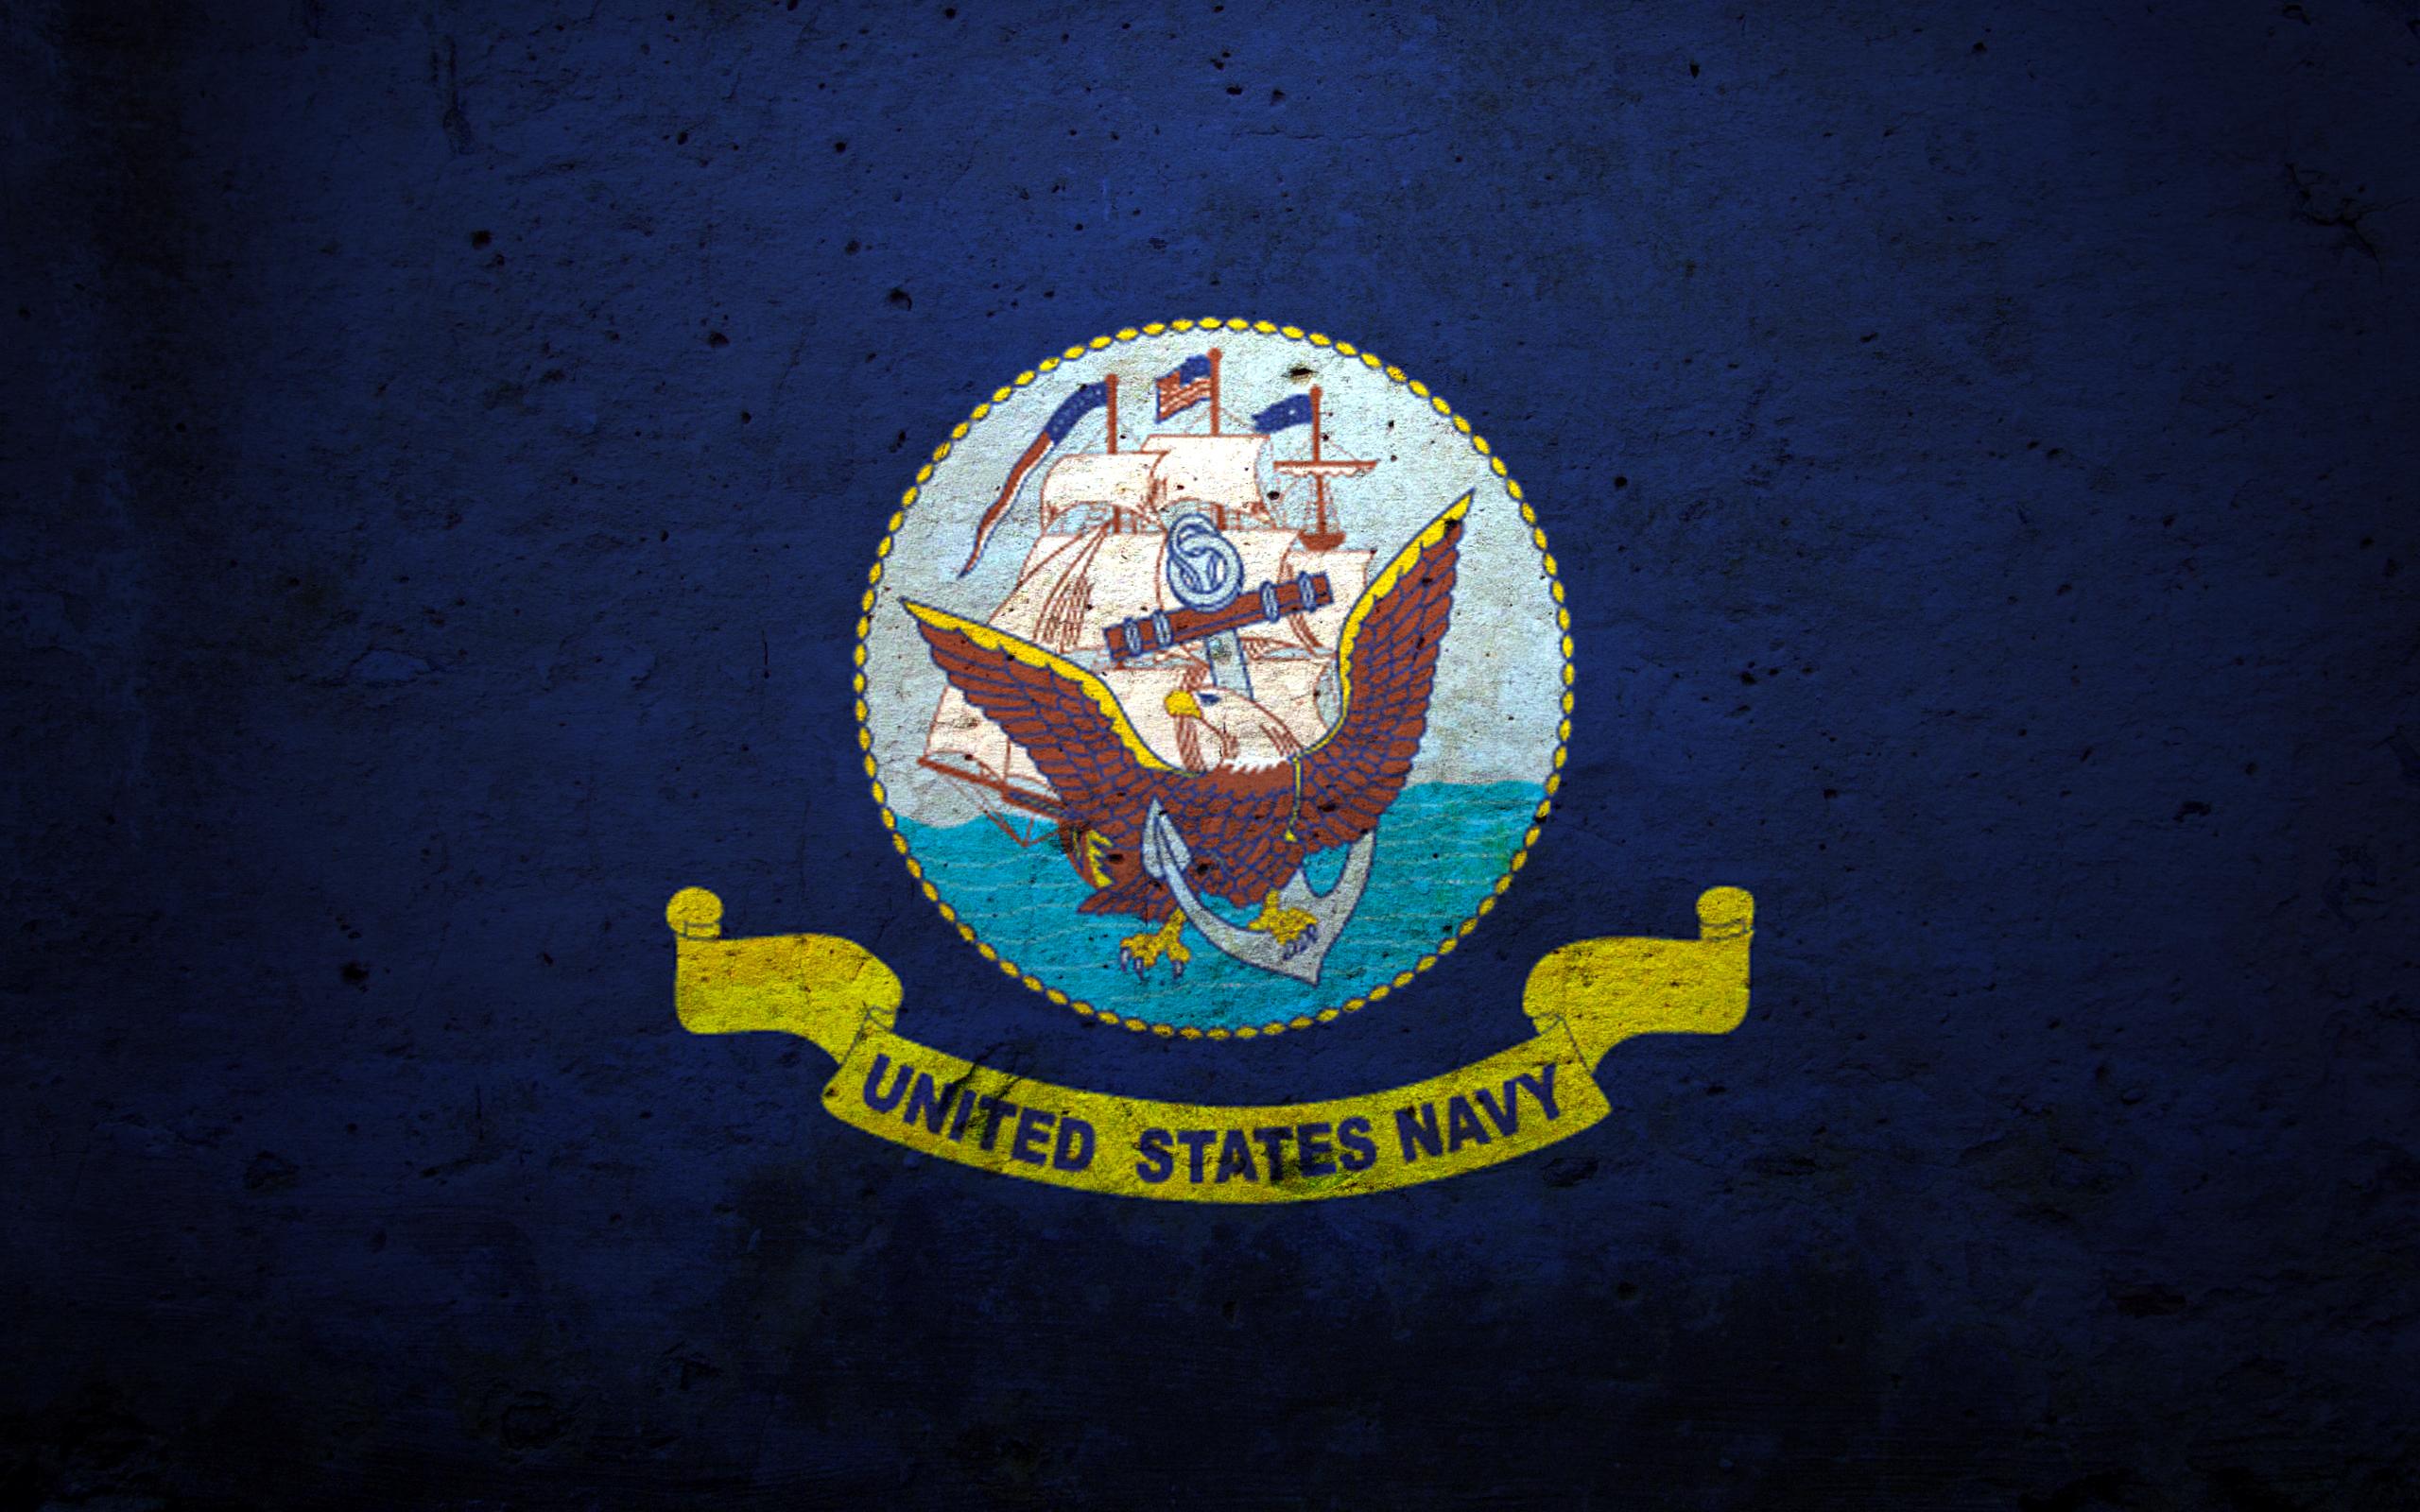 US Navy Wallpaper 2560x1600 US Navy Flags 2560x1600